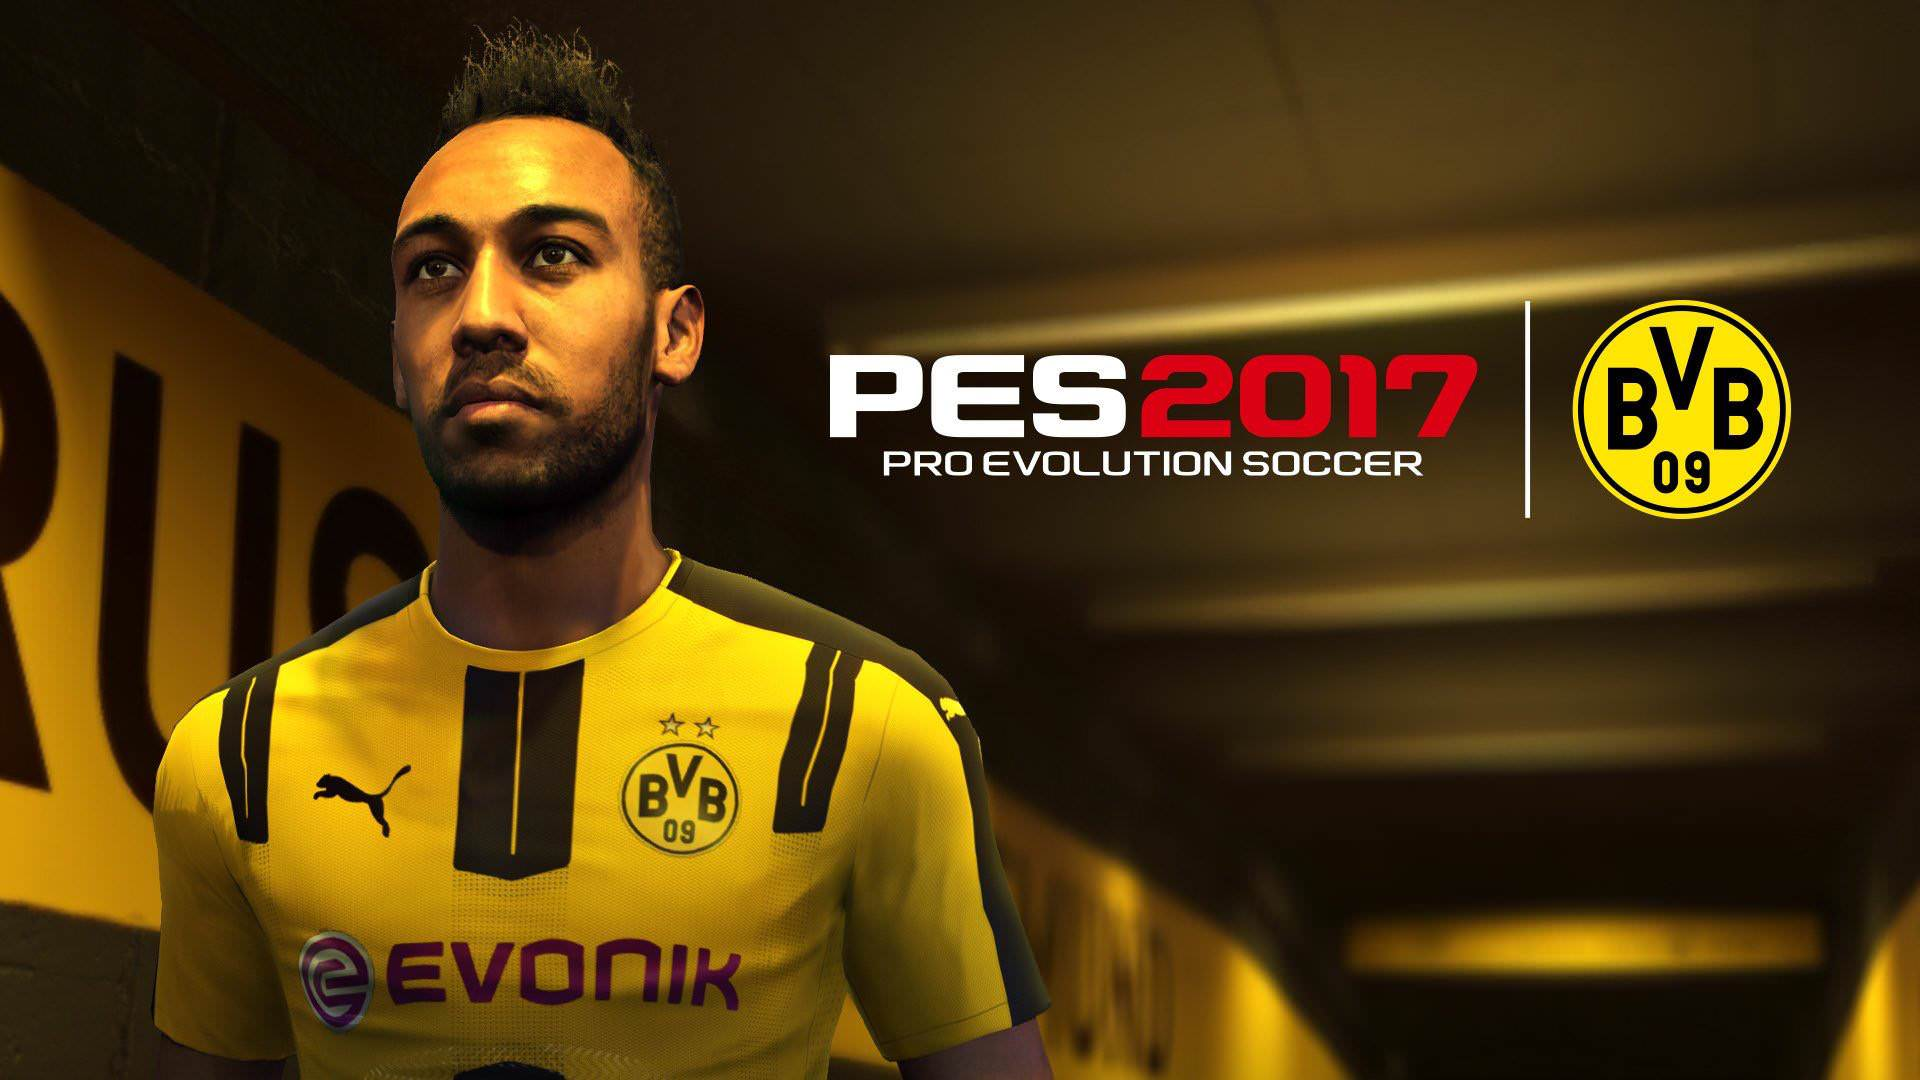 Free download PES 2017 Borussia Dortmund Partnership with Konami